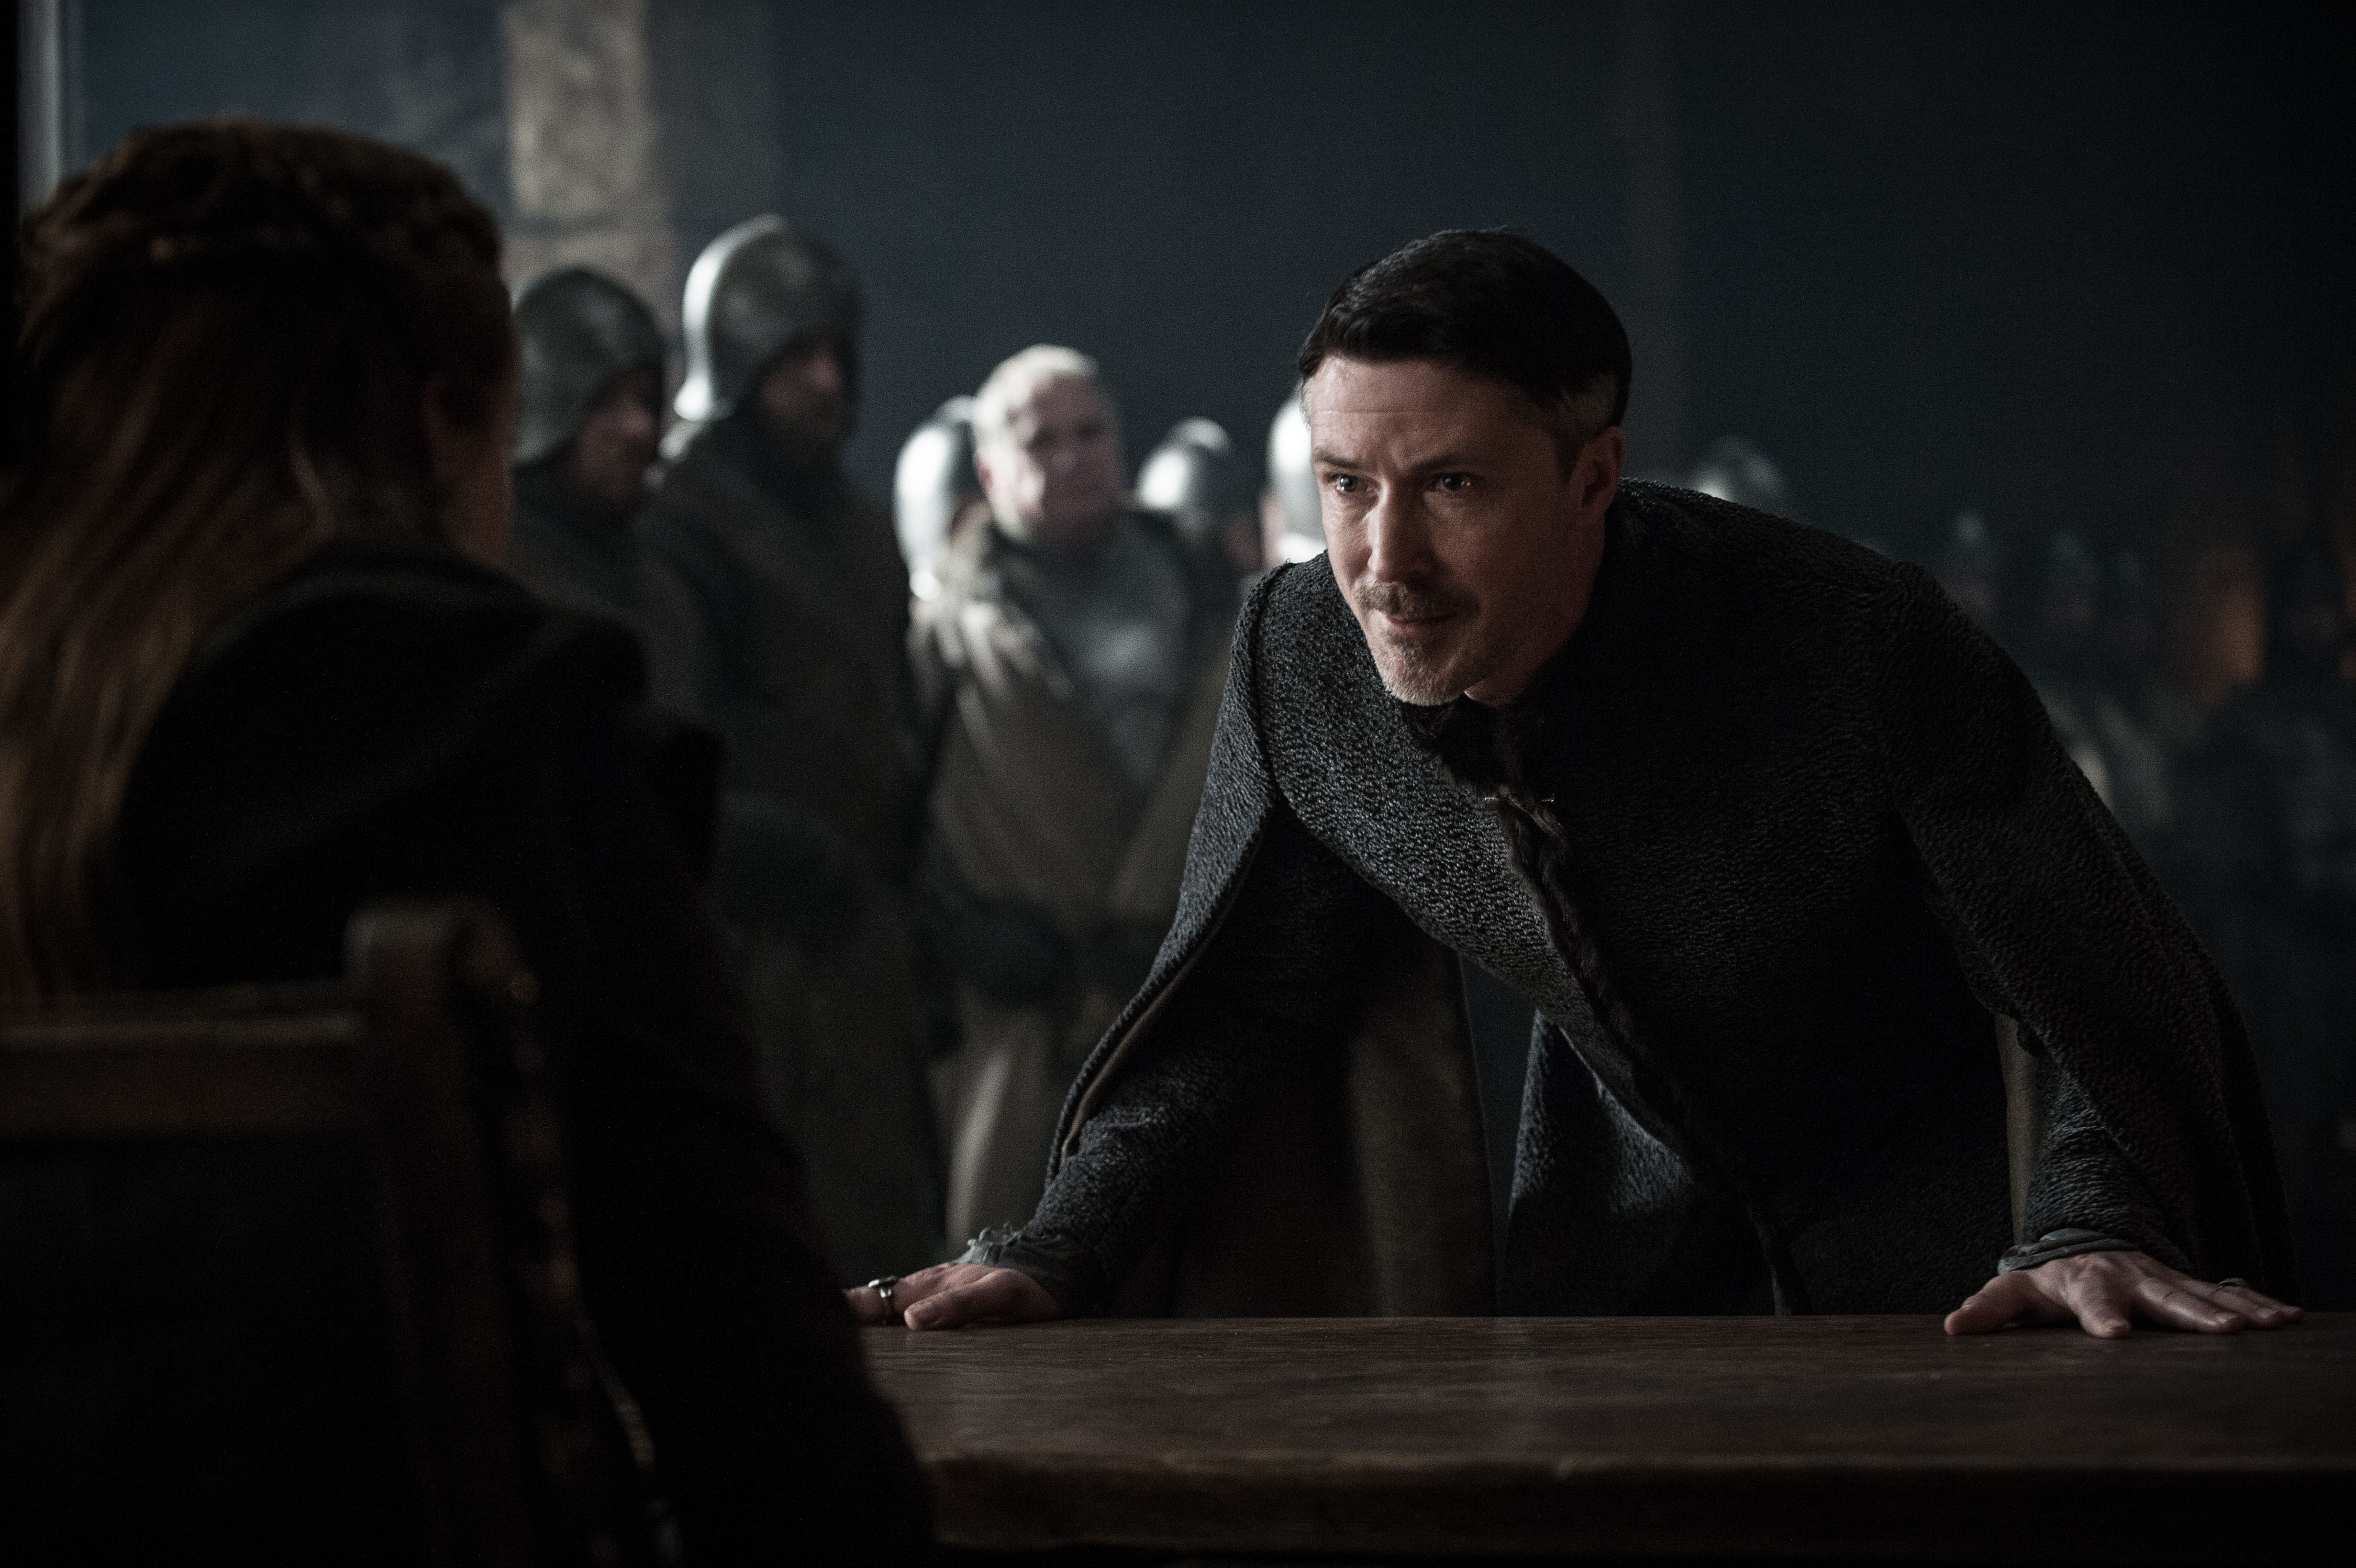 Aidan Gillen Petyr Baelish Sansa Stark Sophie Turner 4500x2995